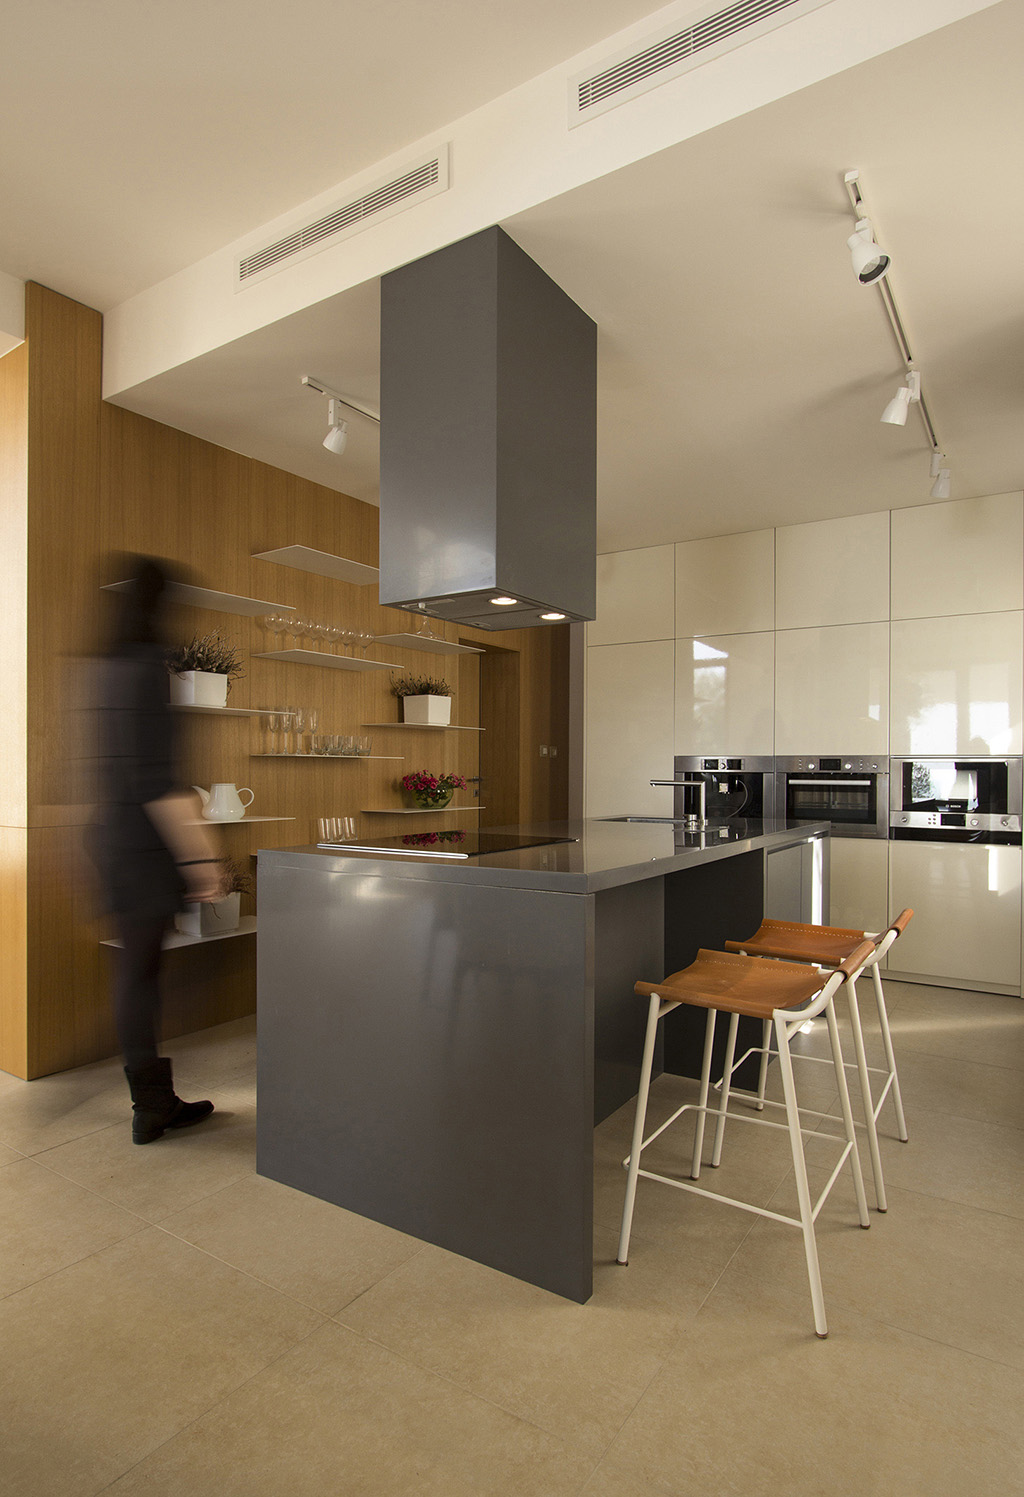 Rezevici apartment    Architects: Soba+